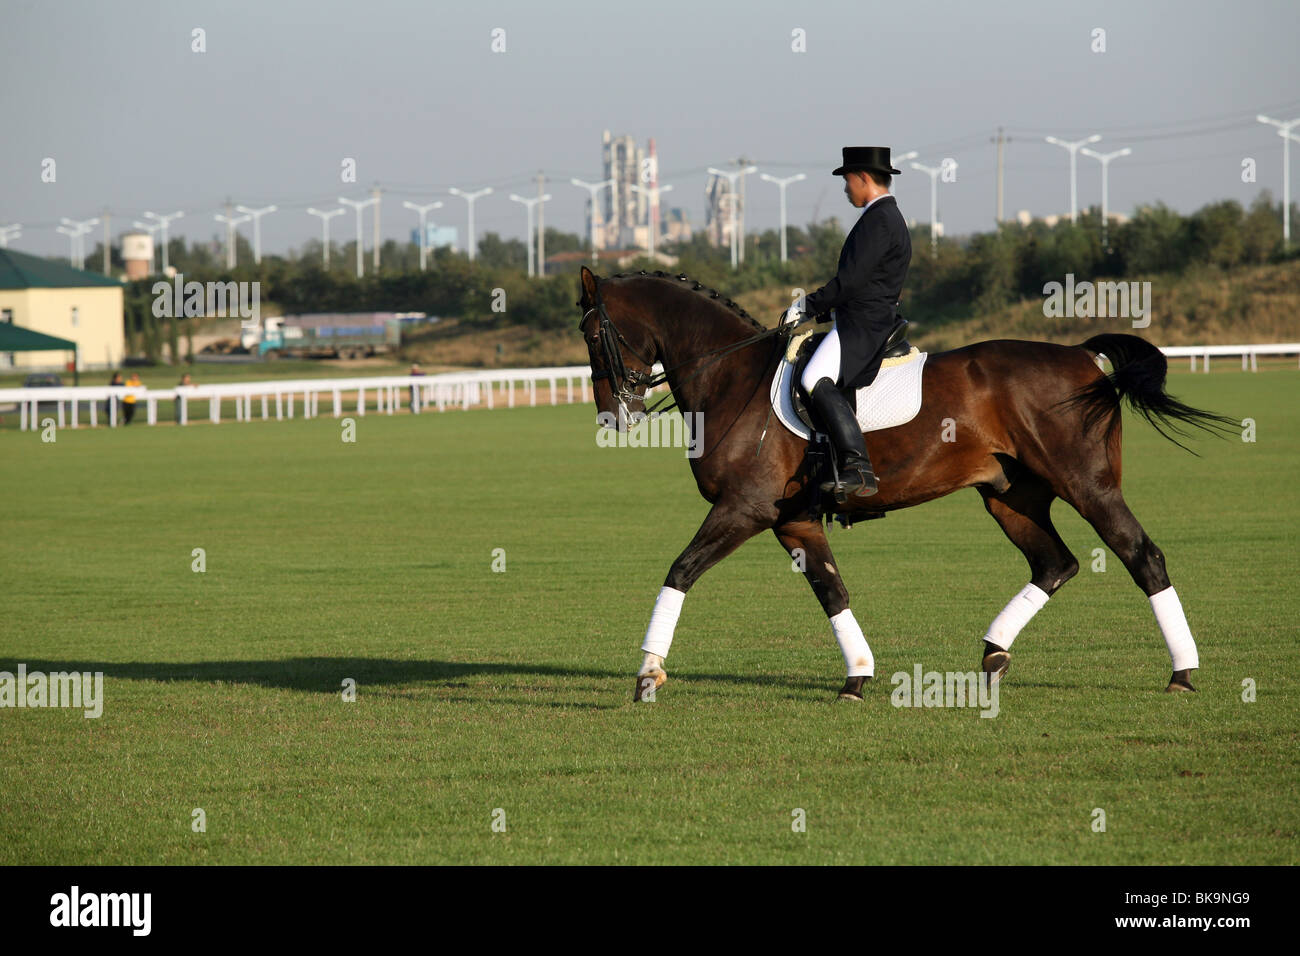 Carreras de caballos,China Imagen De Stock